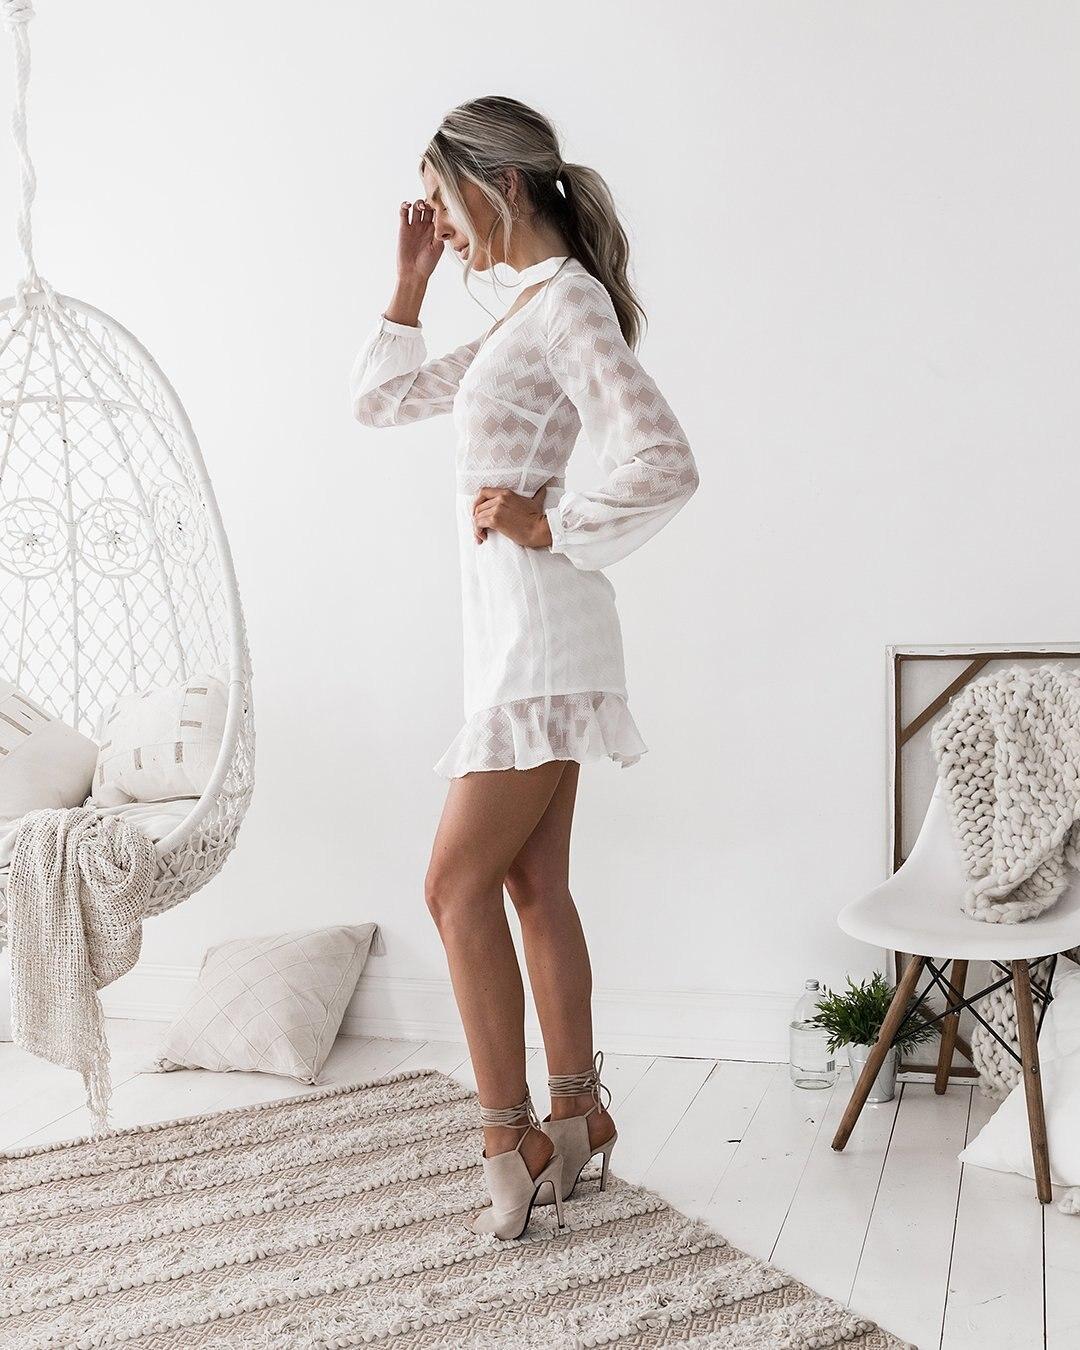 mini dress elegant sexy party club beach dress short white dress long sleeve chiffon ruffle ladies clothing summer 2018 in Dresses from Women 39 s Clothing